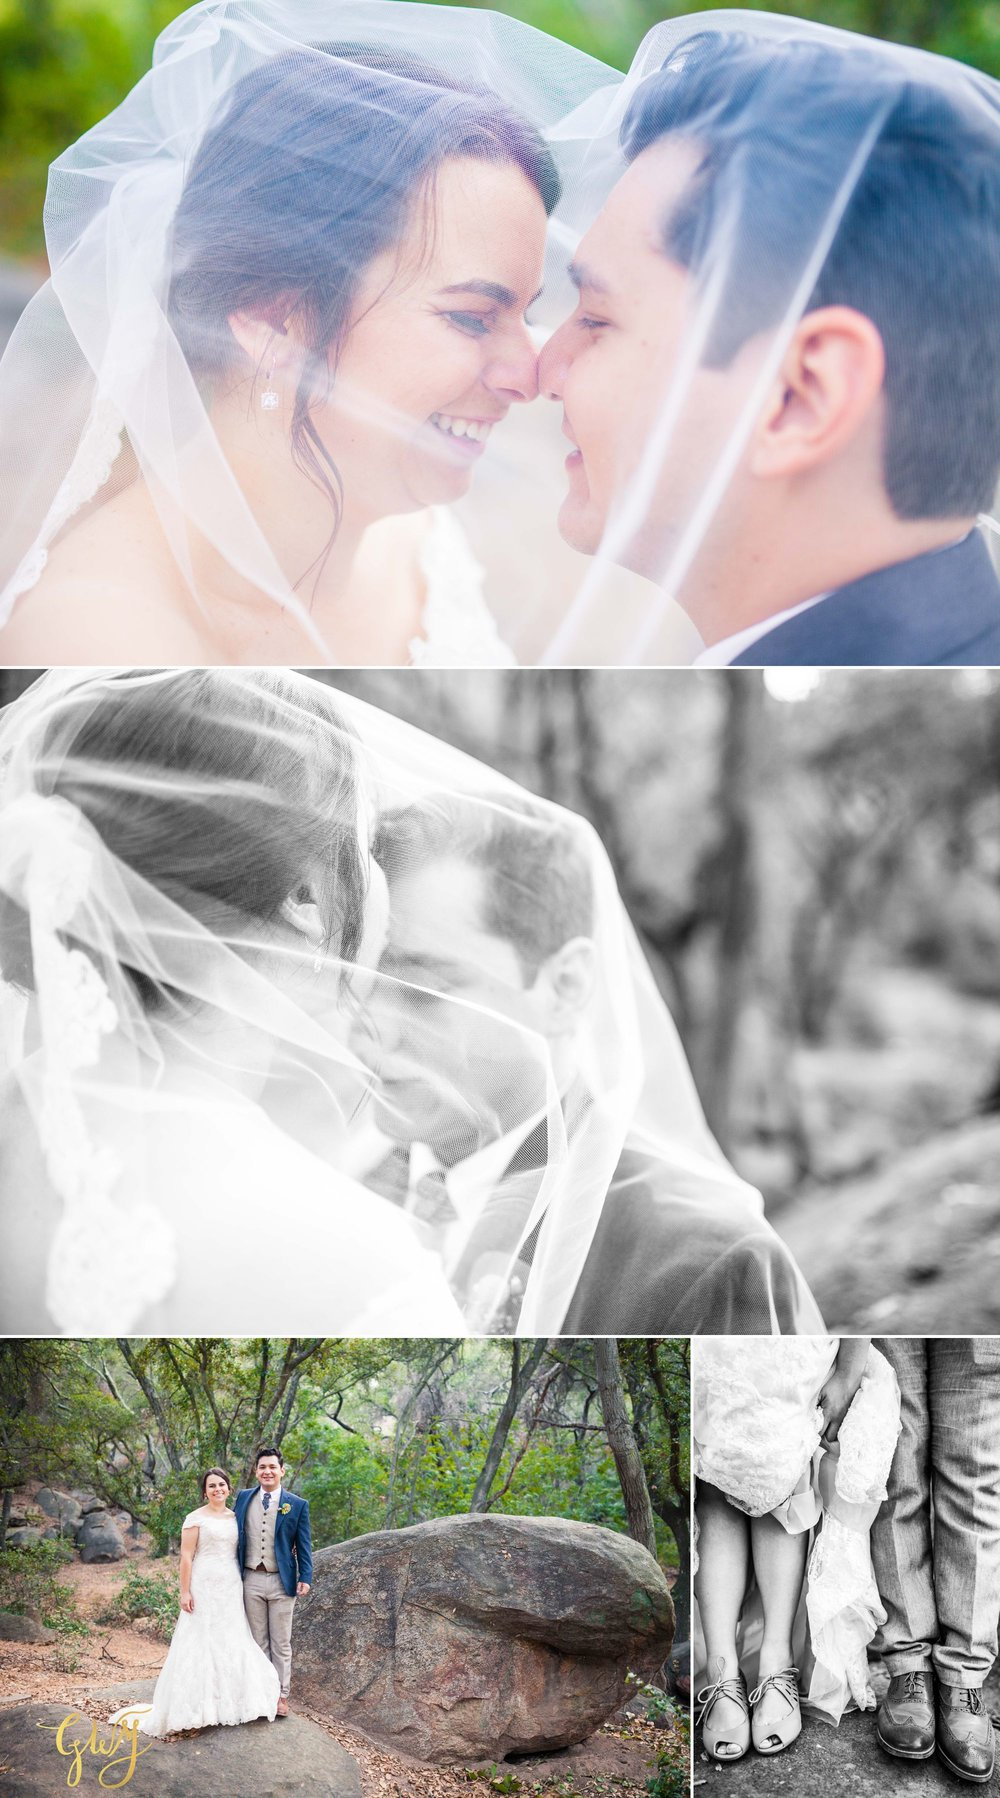 Hannah + Lorenzo Secluded Garden Estate Temecula DIY Wedding by Glass Woods Media 19.jpg